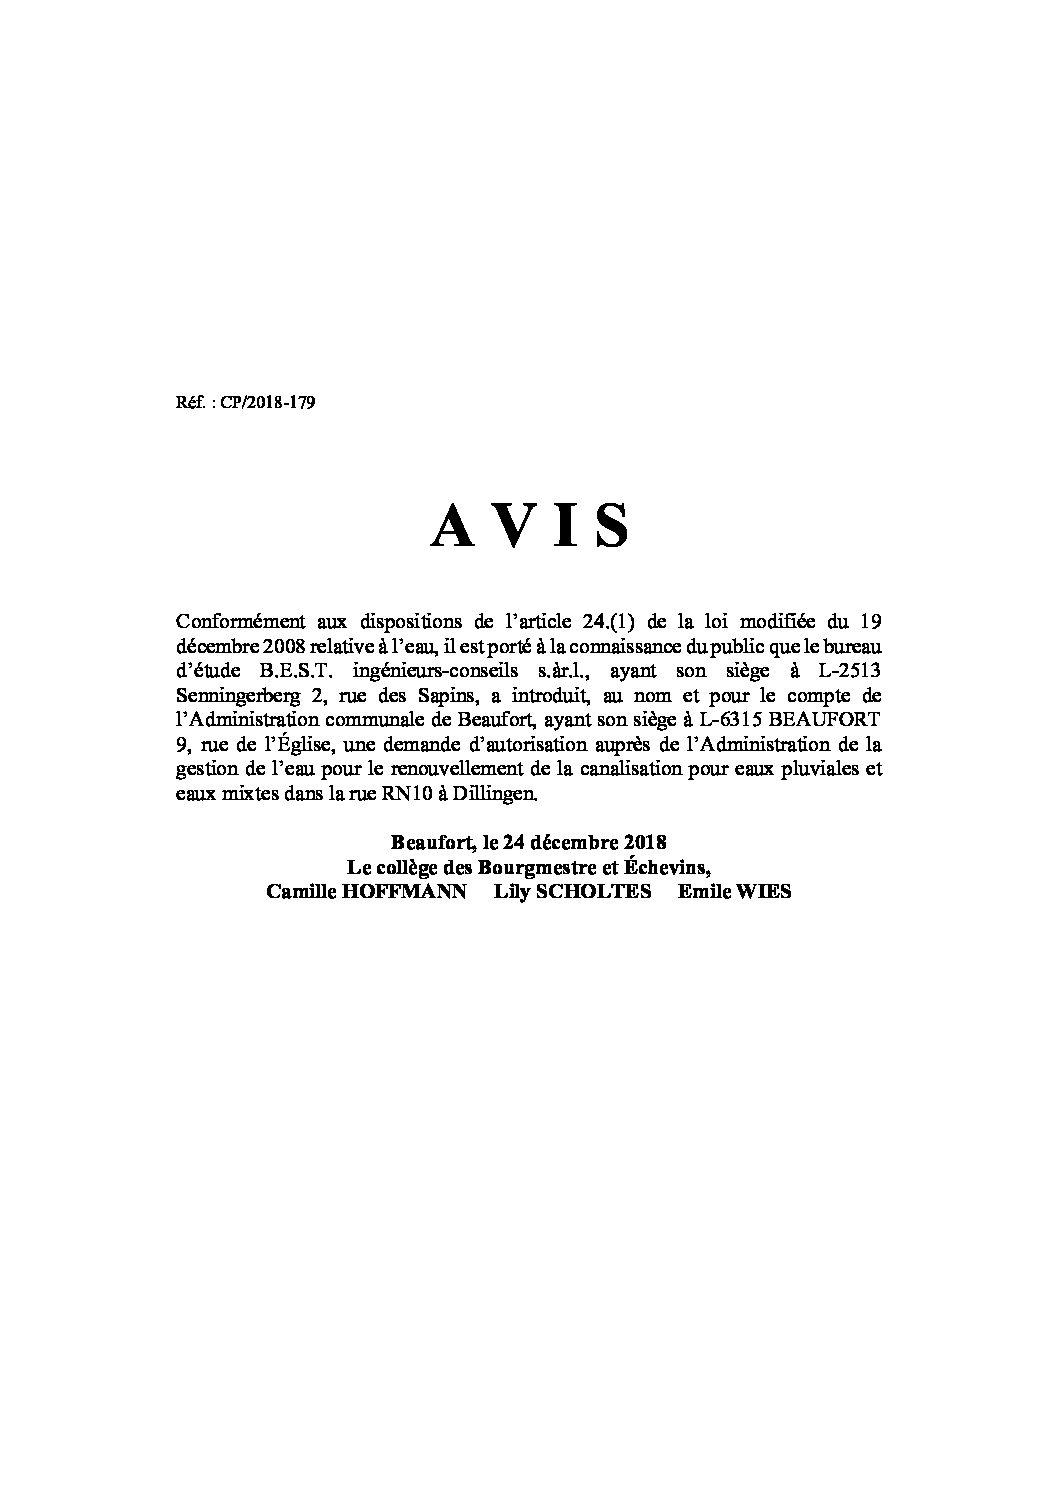 20181224_AvisEau